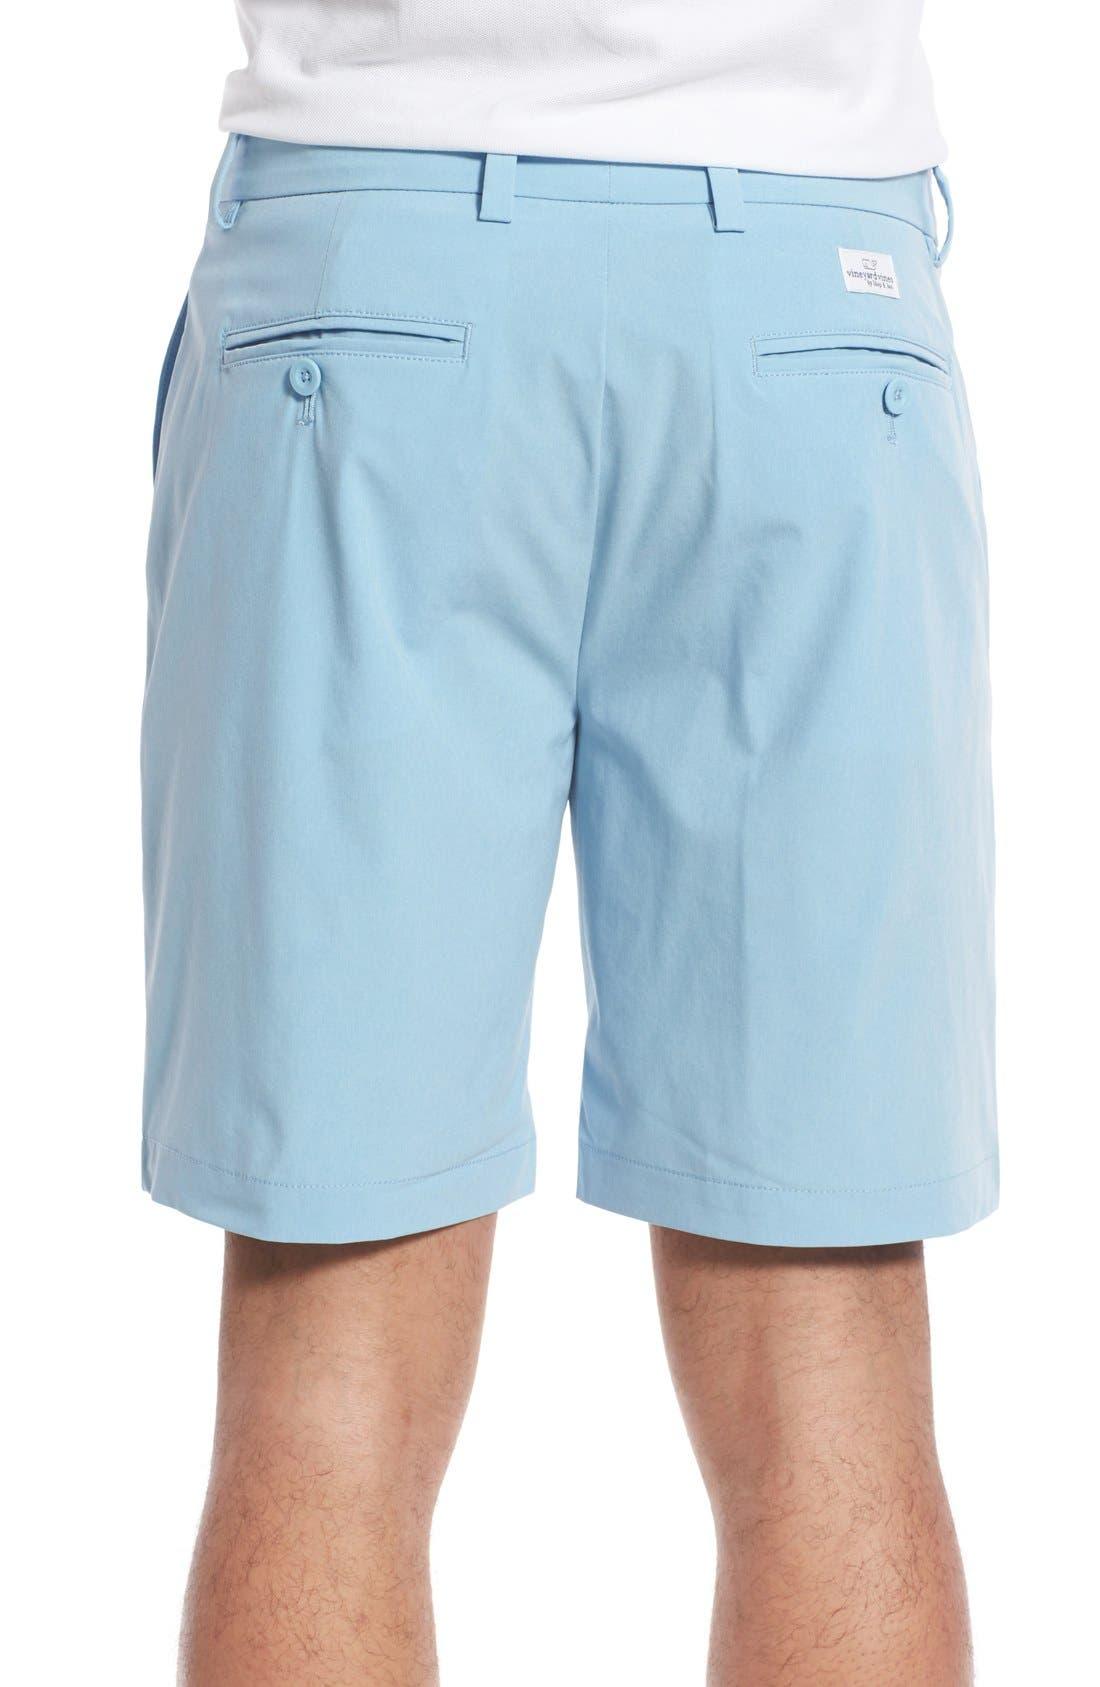 8 Inch Performance Breaker Shorts,                             Alternate thumbnail 57, color,